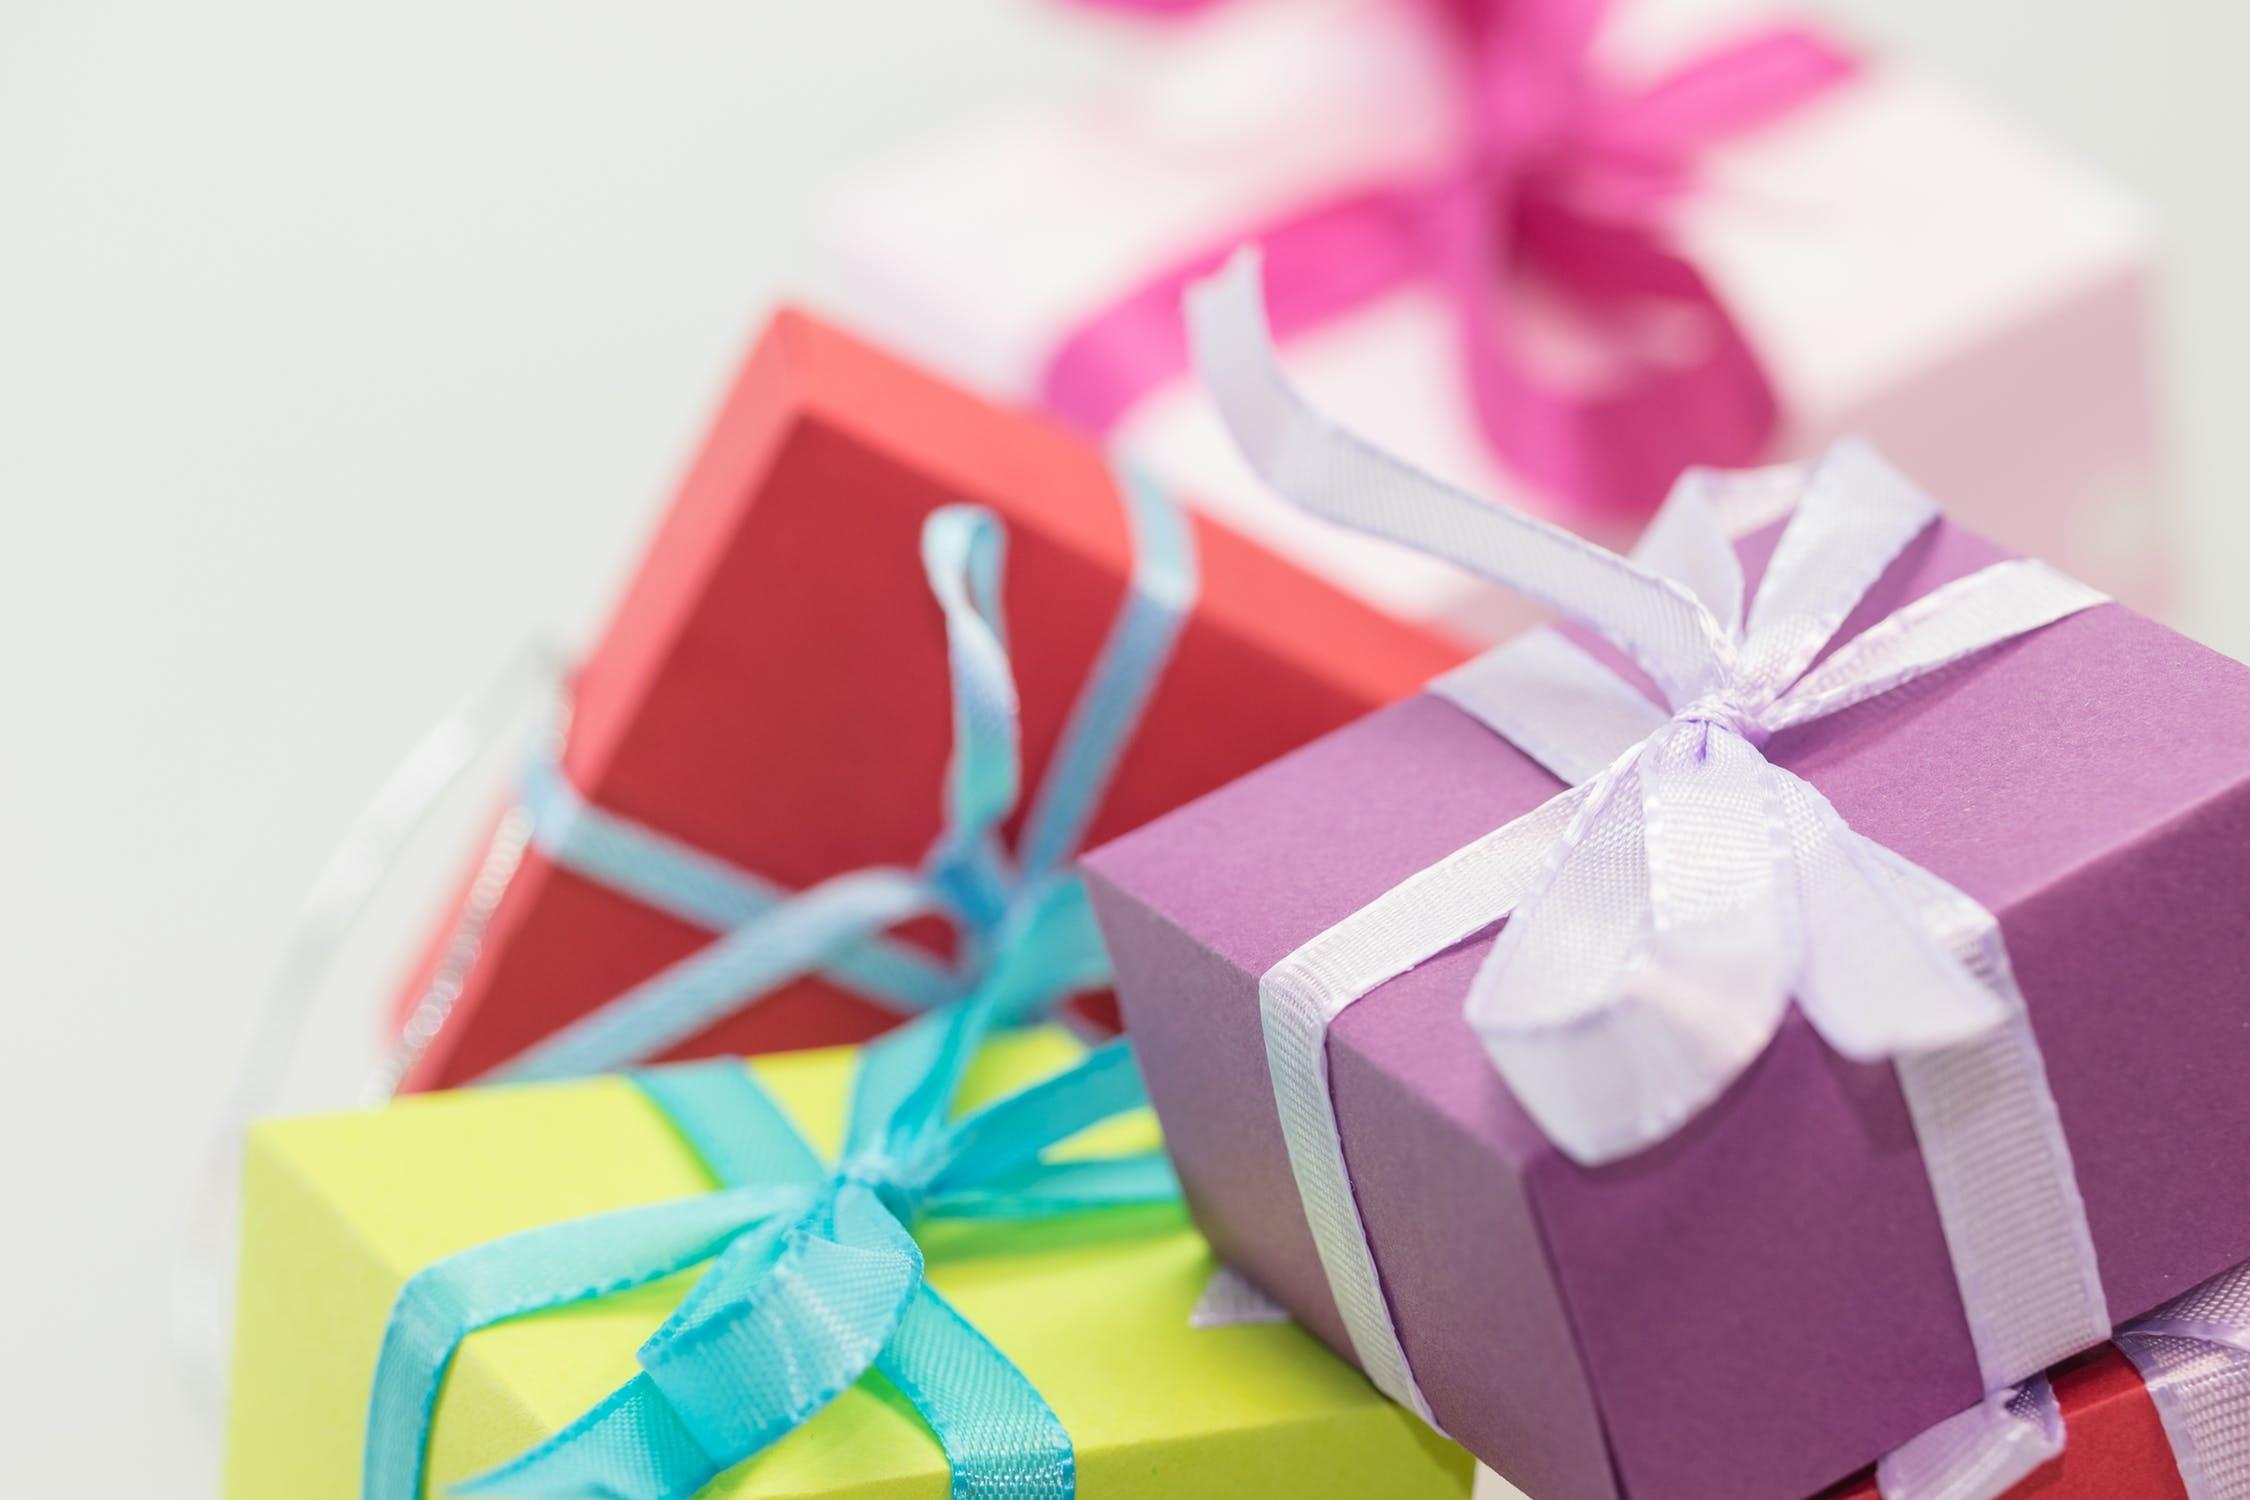 Giv flotte gaver med gaveæsker